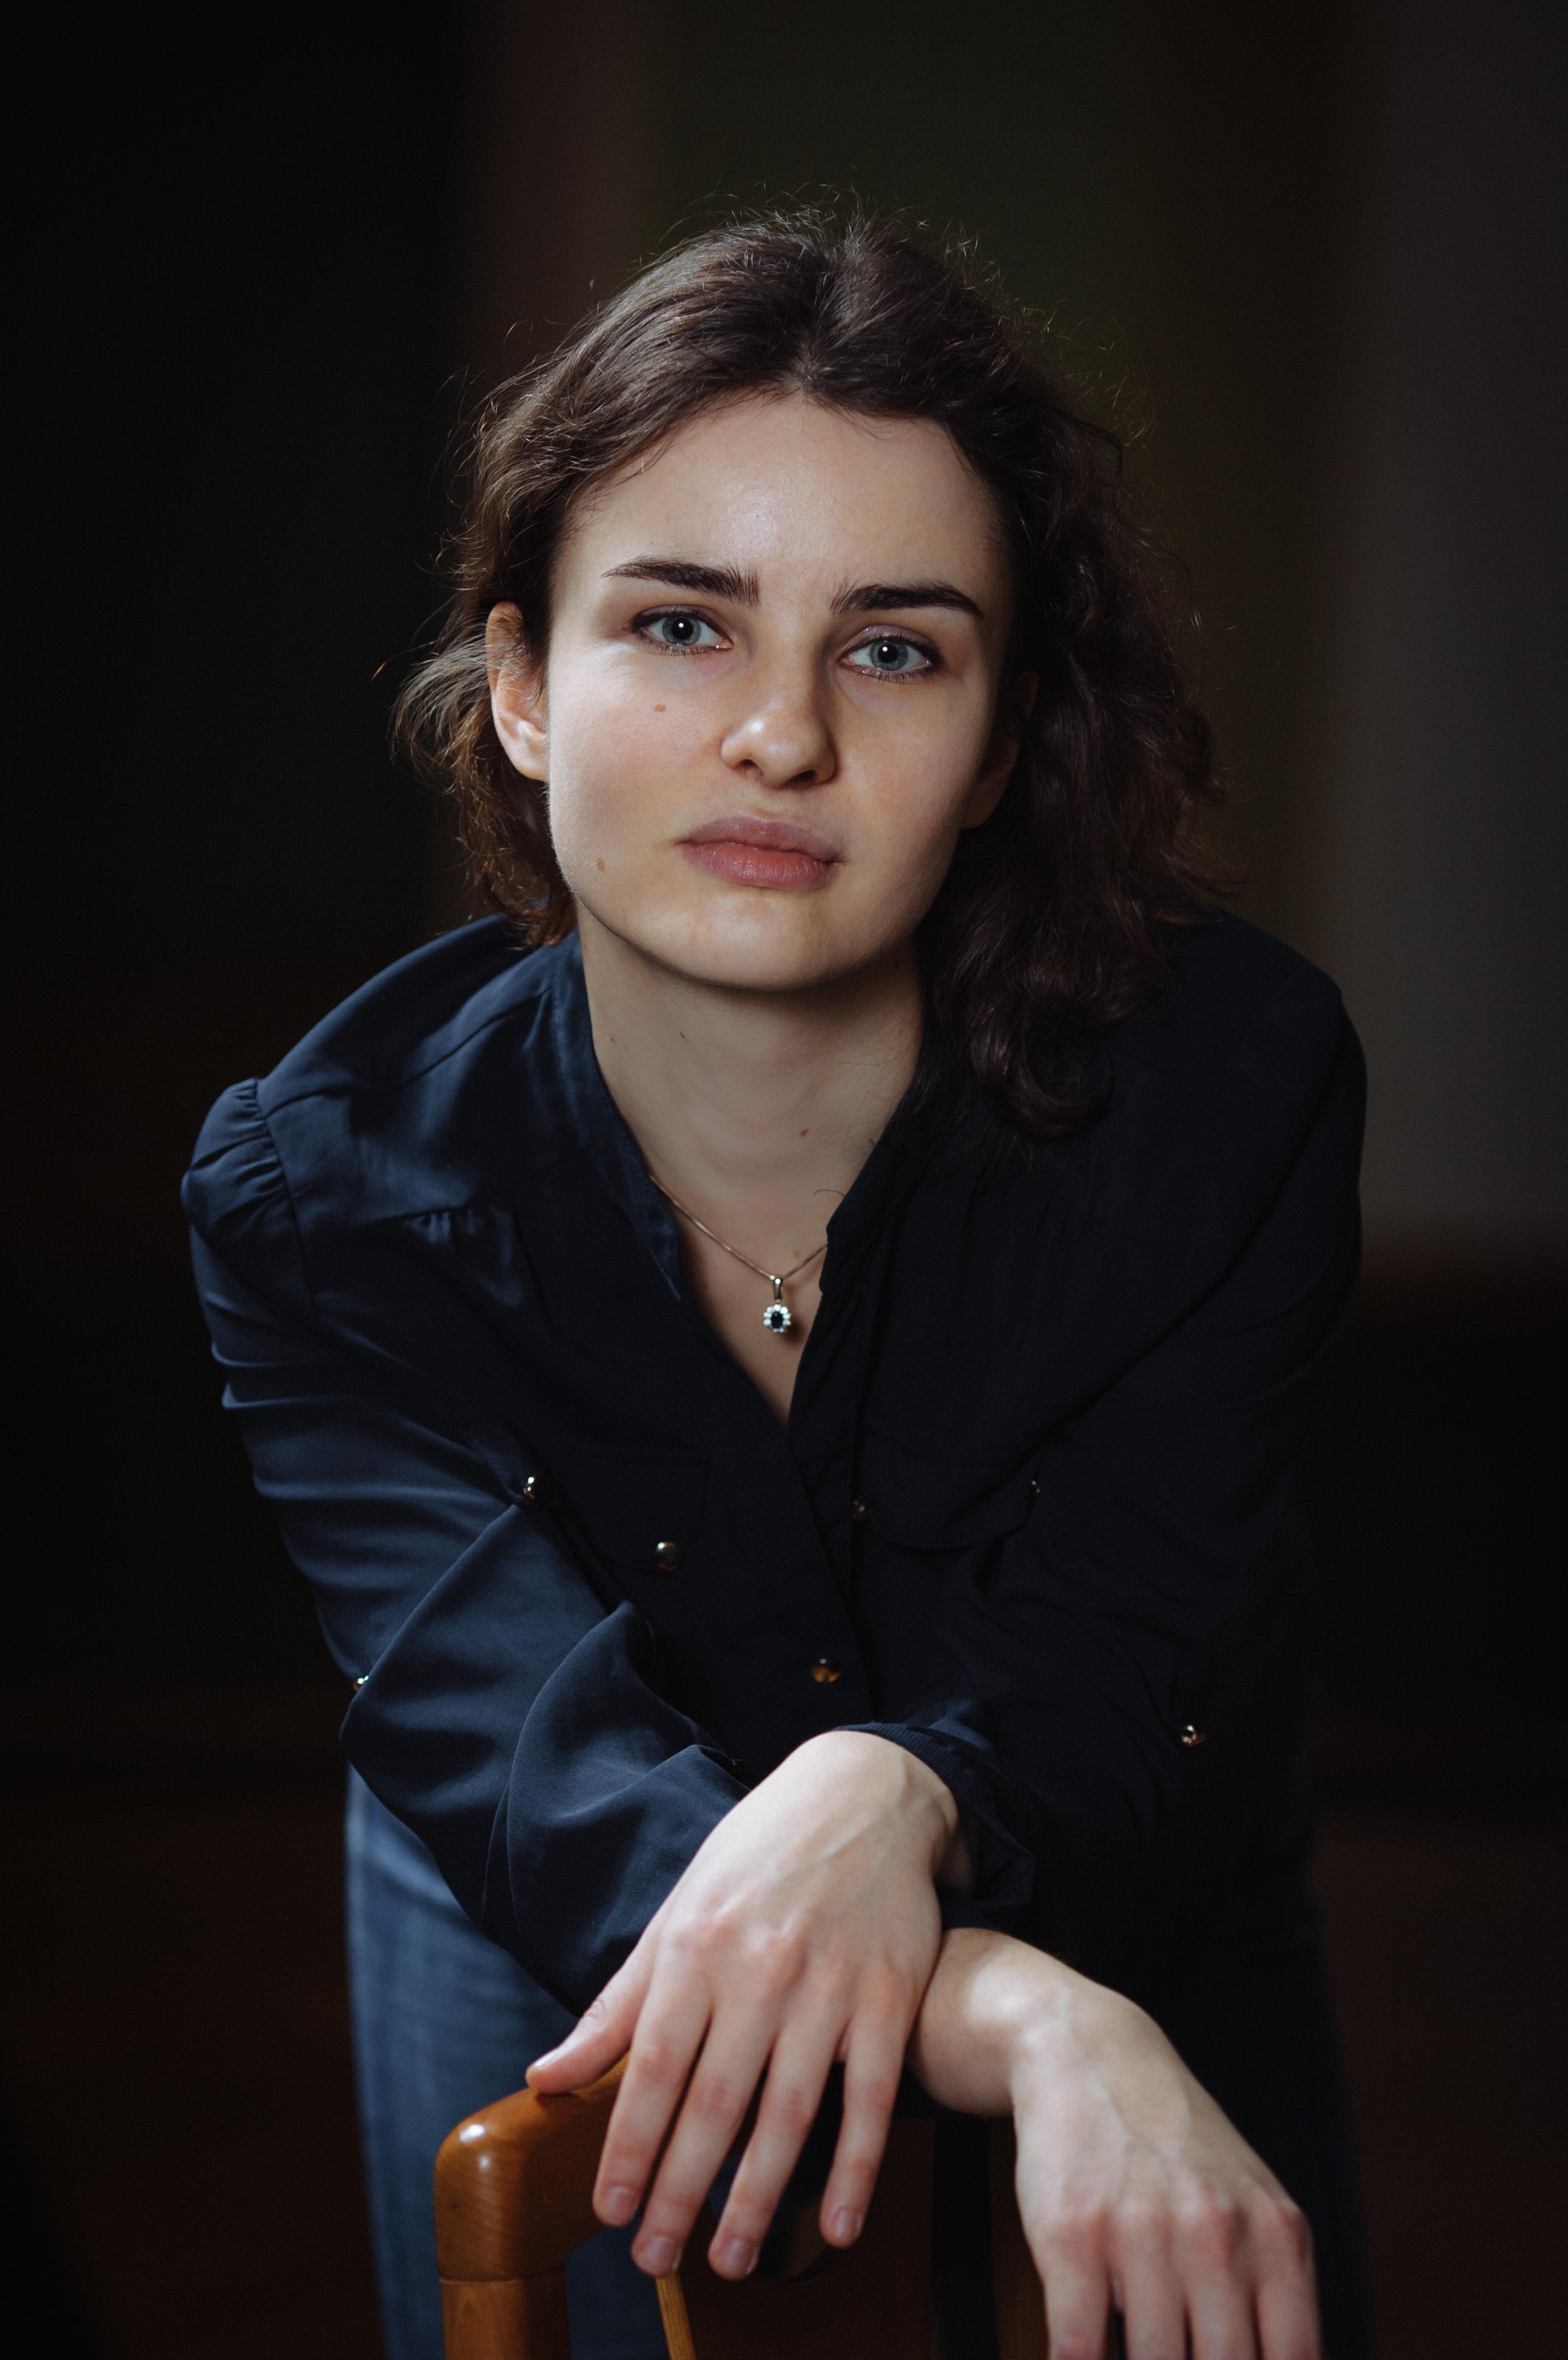 Anna Faustova